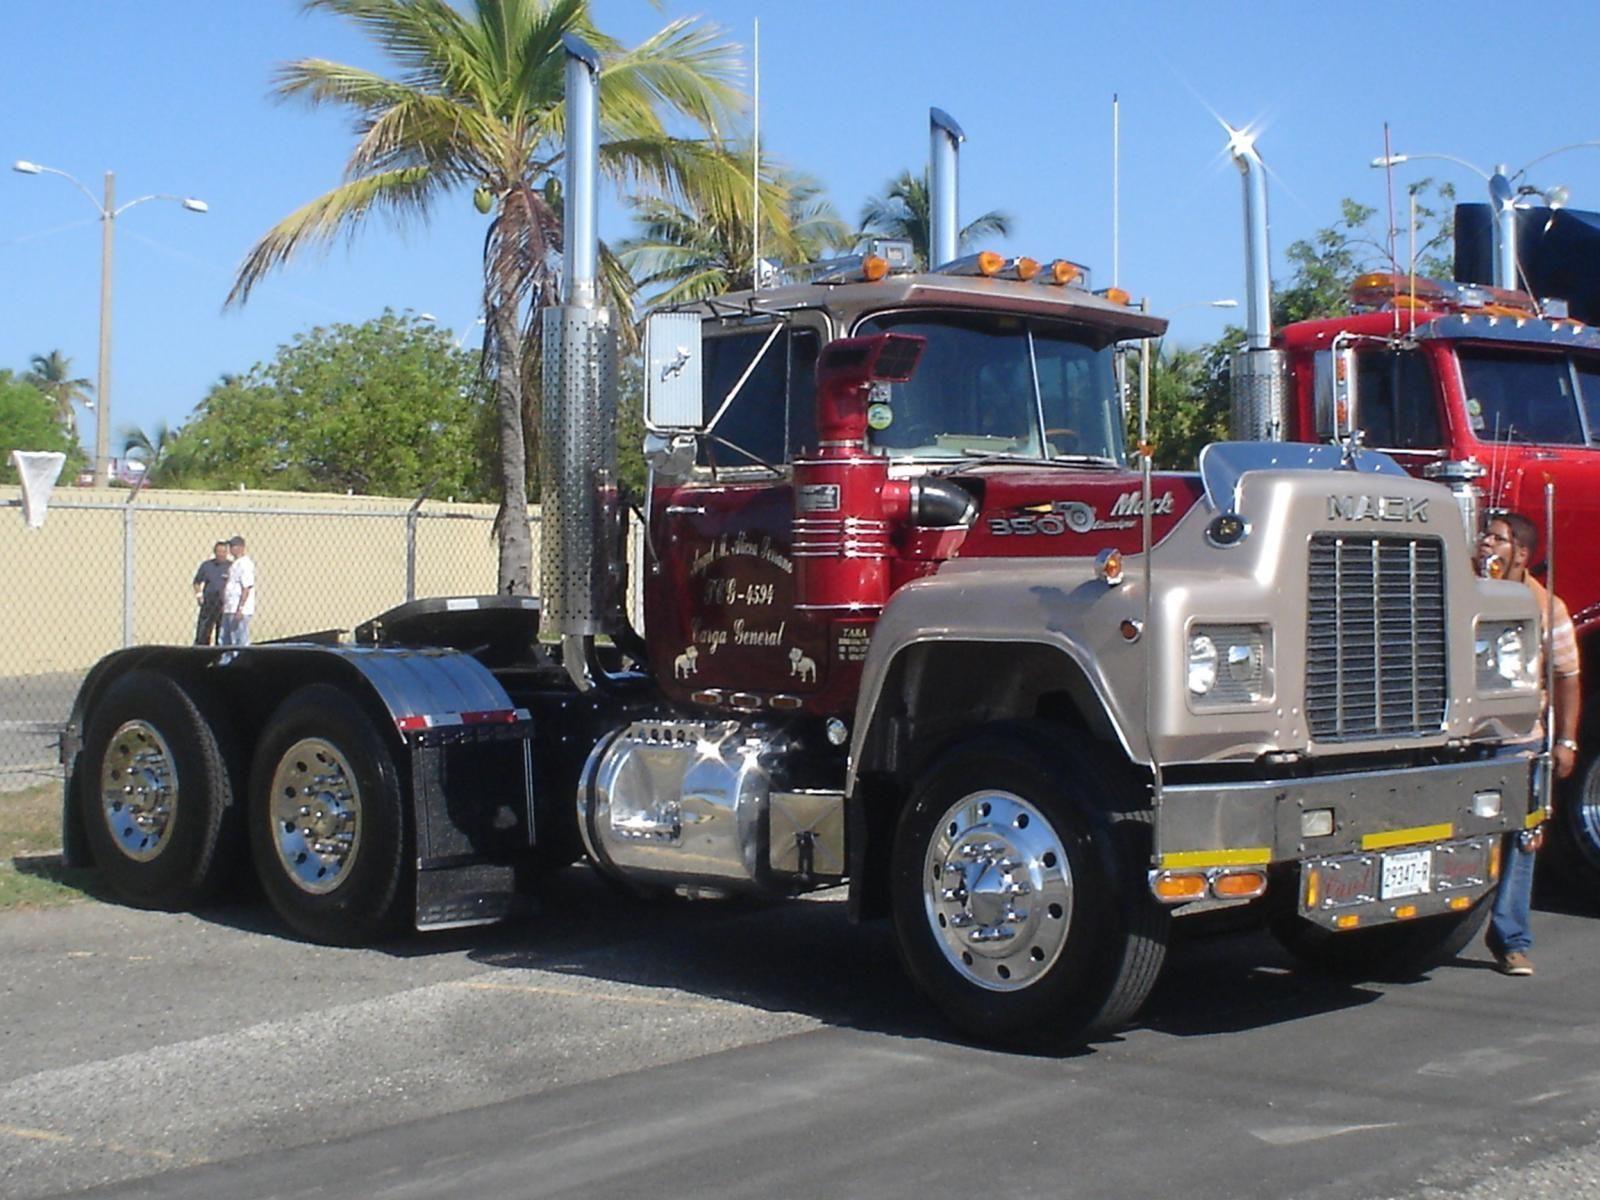 R Model Mack Show Truck : Mack r model show truck google search bitchin trucks